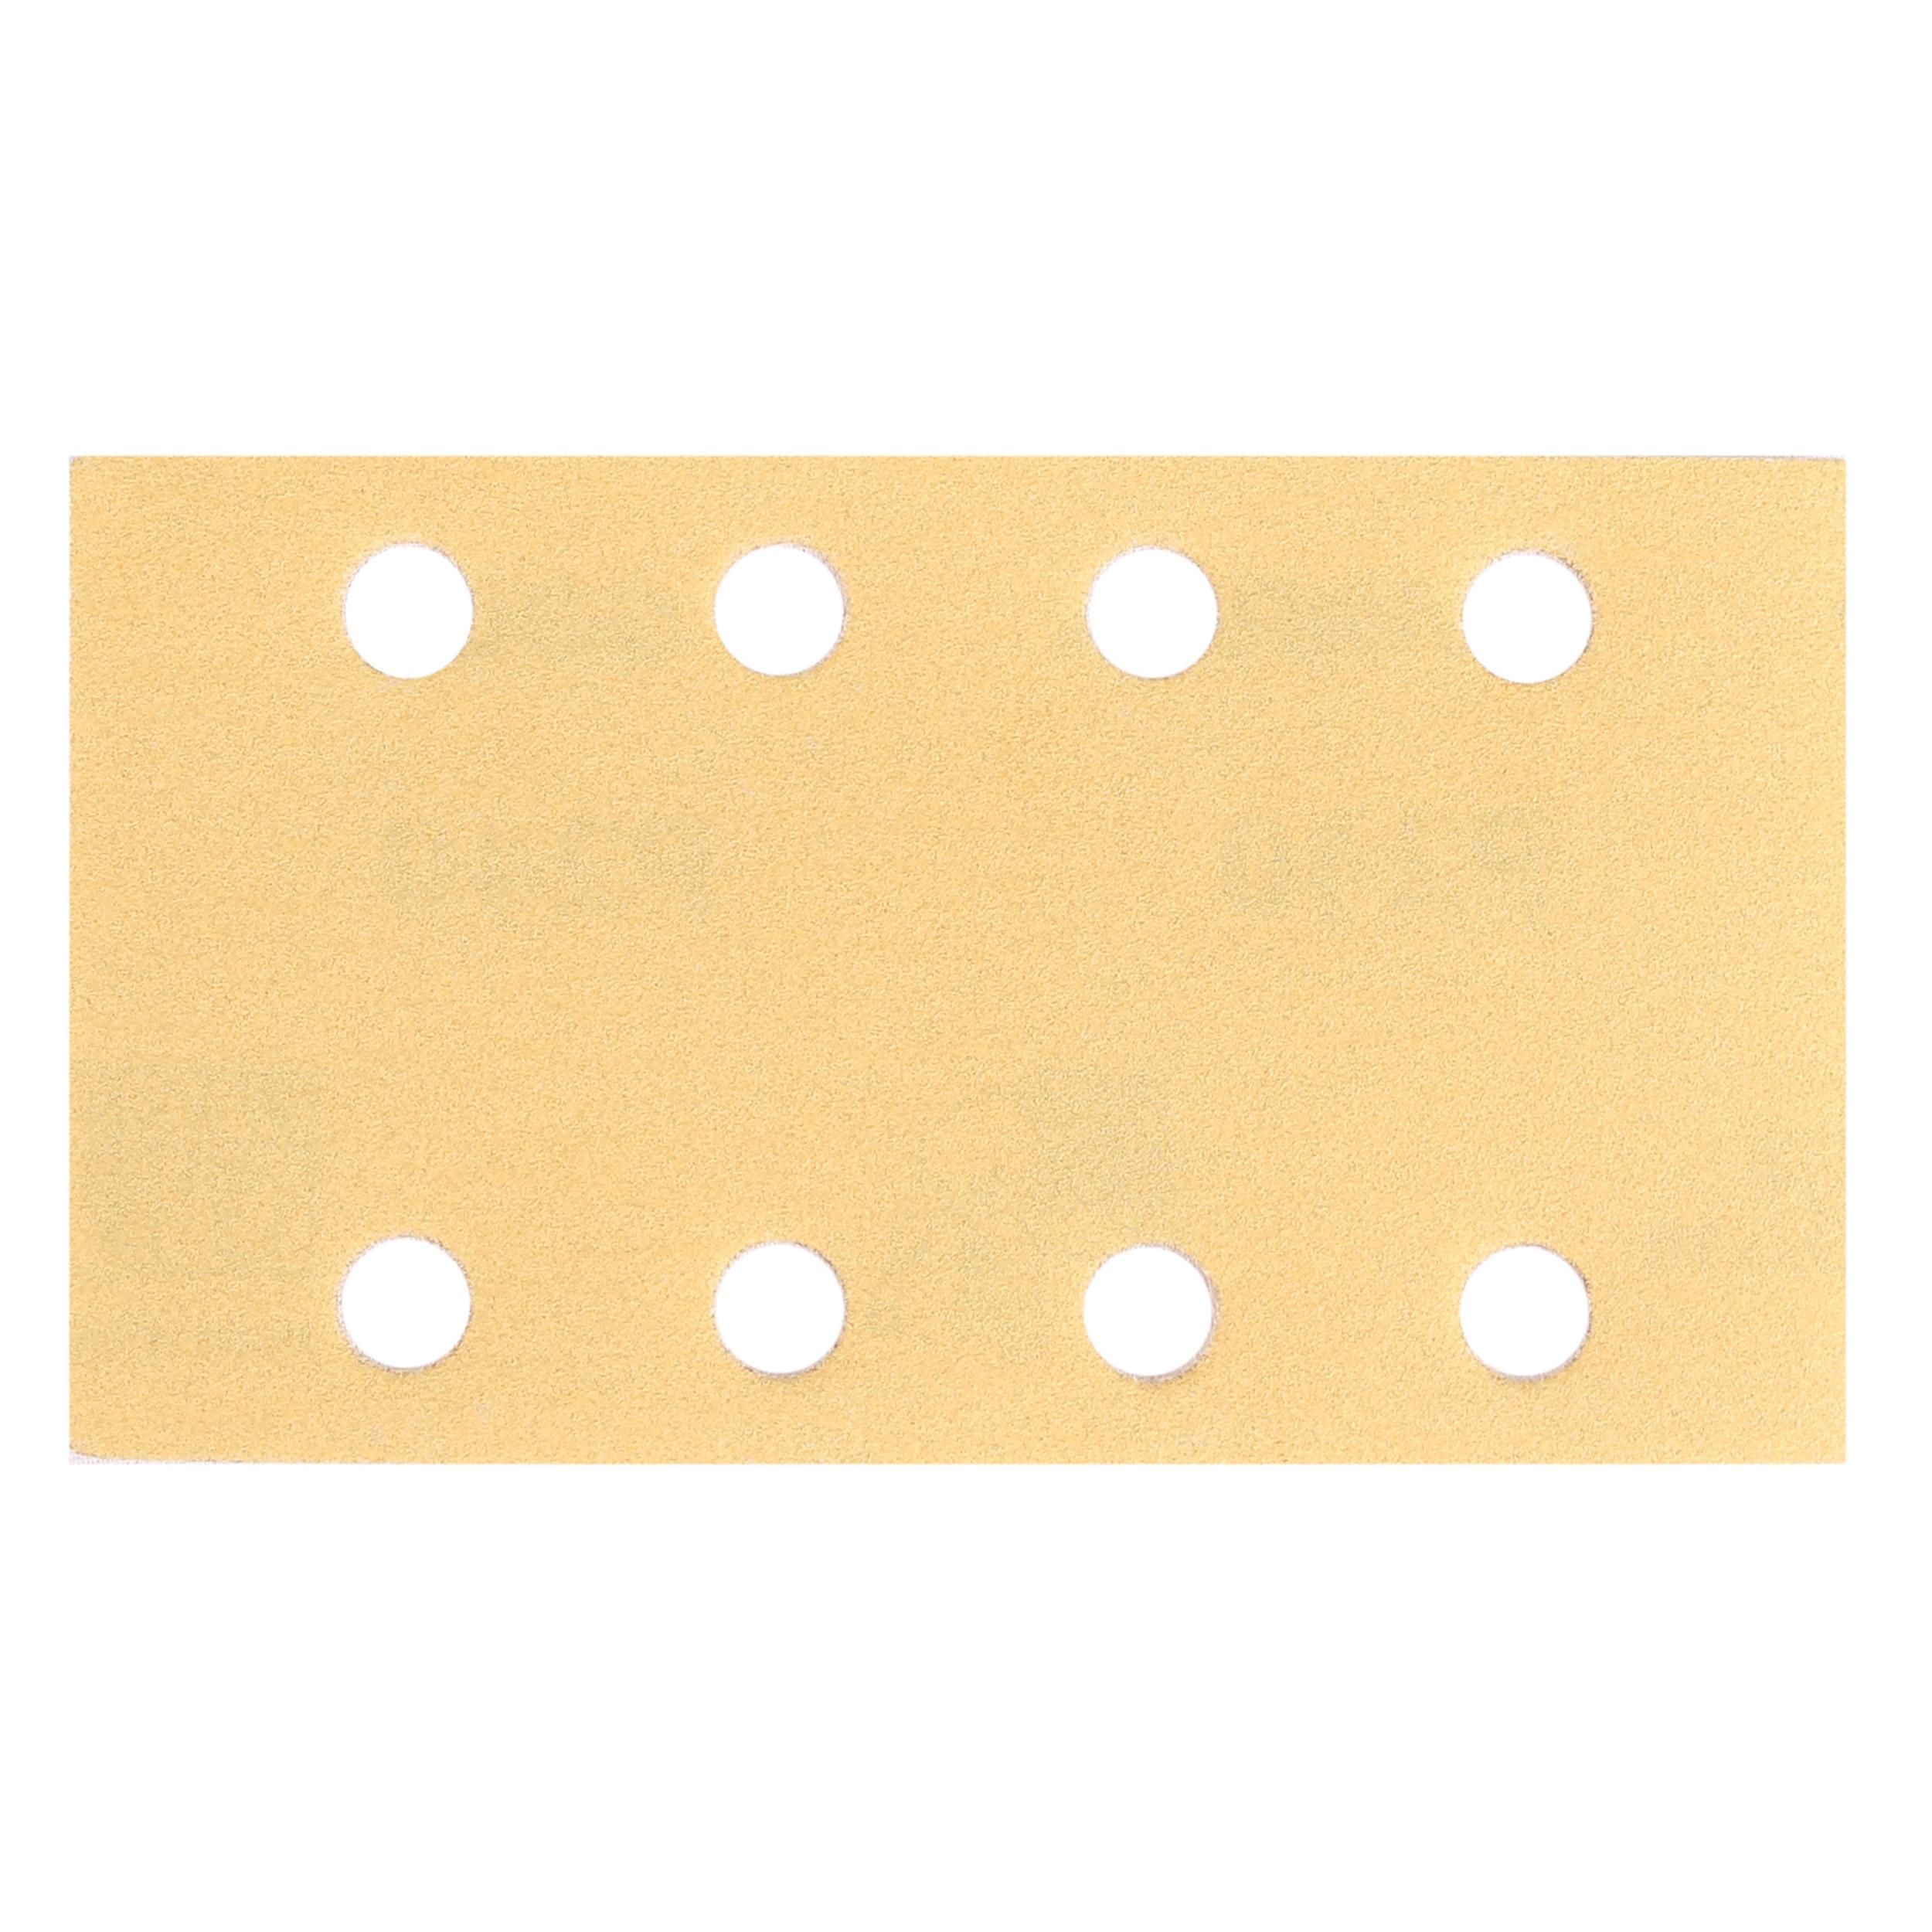 "GOLD 3""x5"" Grip Sandpaper, 8H P150, 50 Sheets/Box"